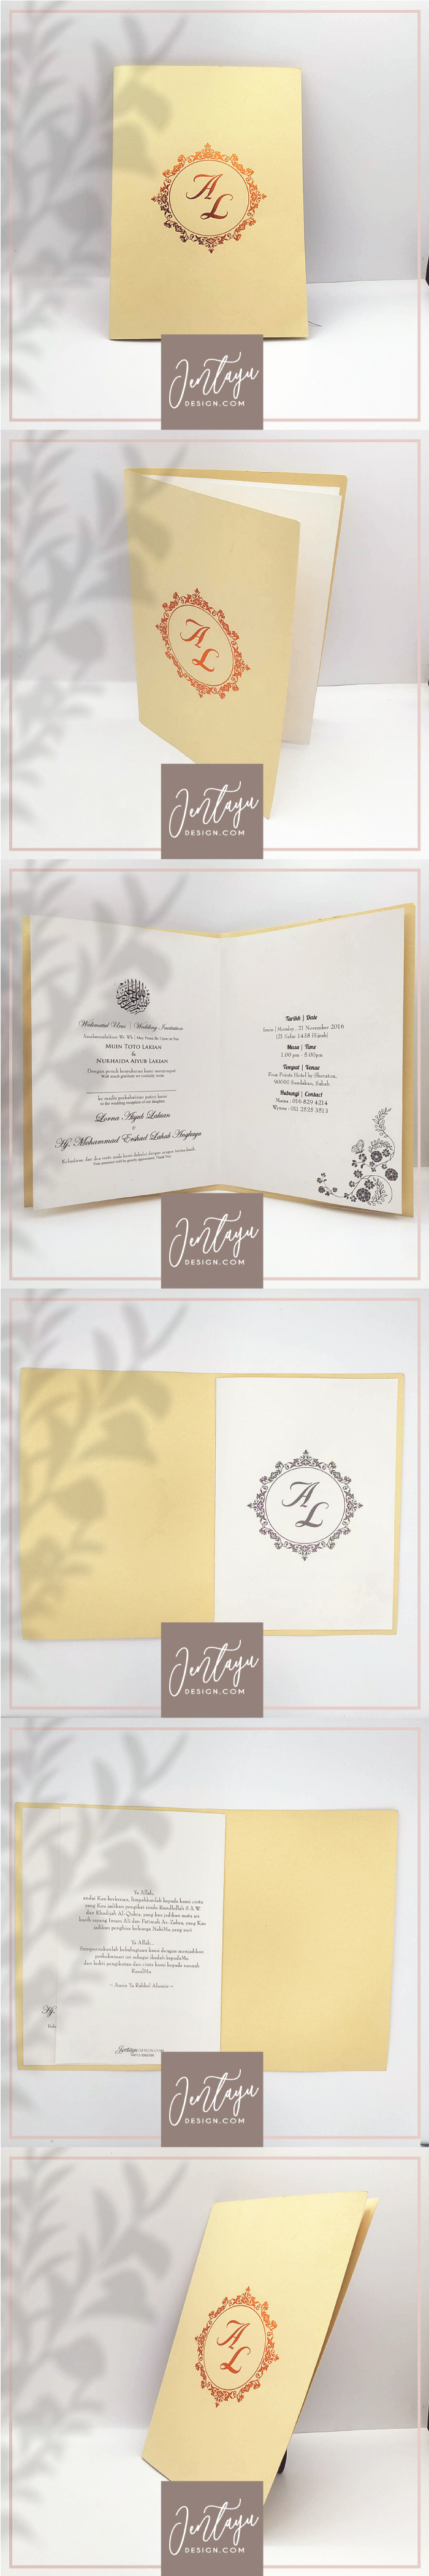 jentayu design kad kahwin formal vip royal berlipat metallic folded wedding cards A4 A5